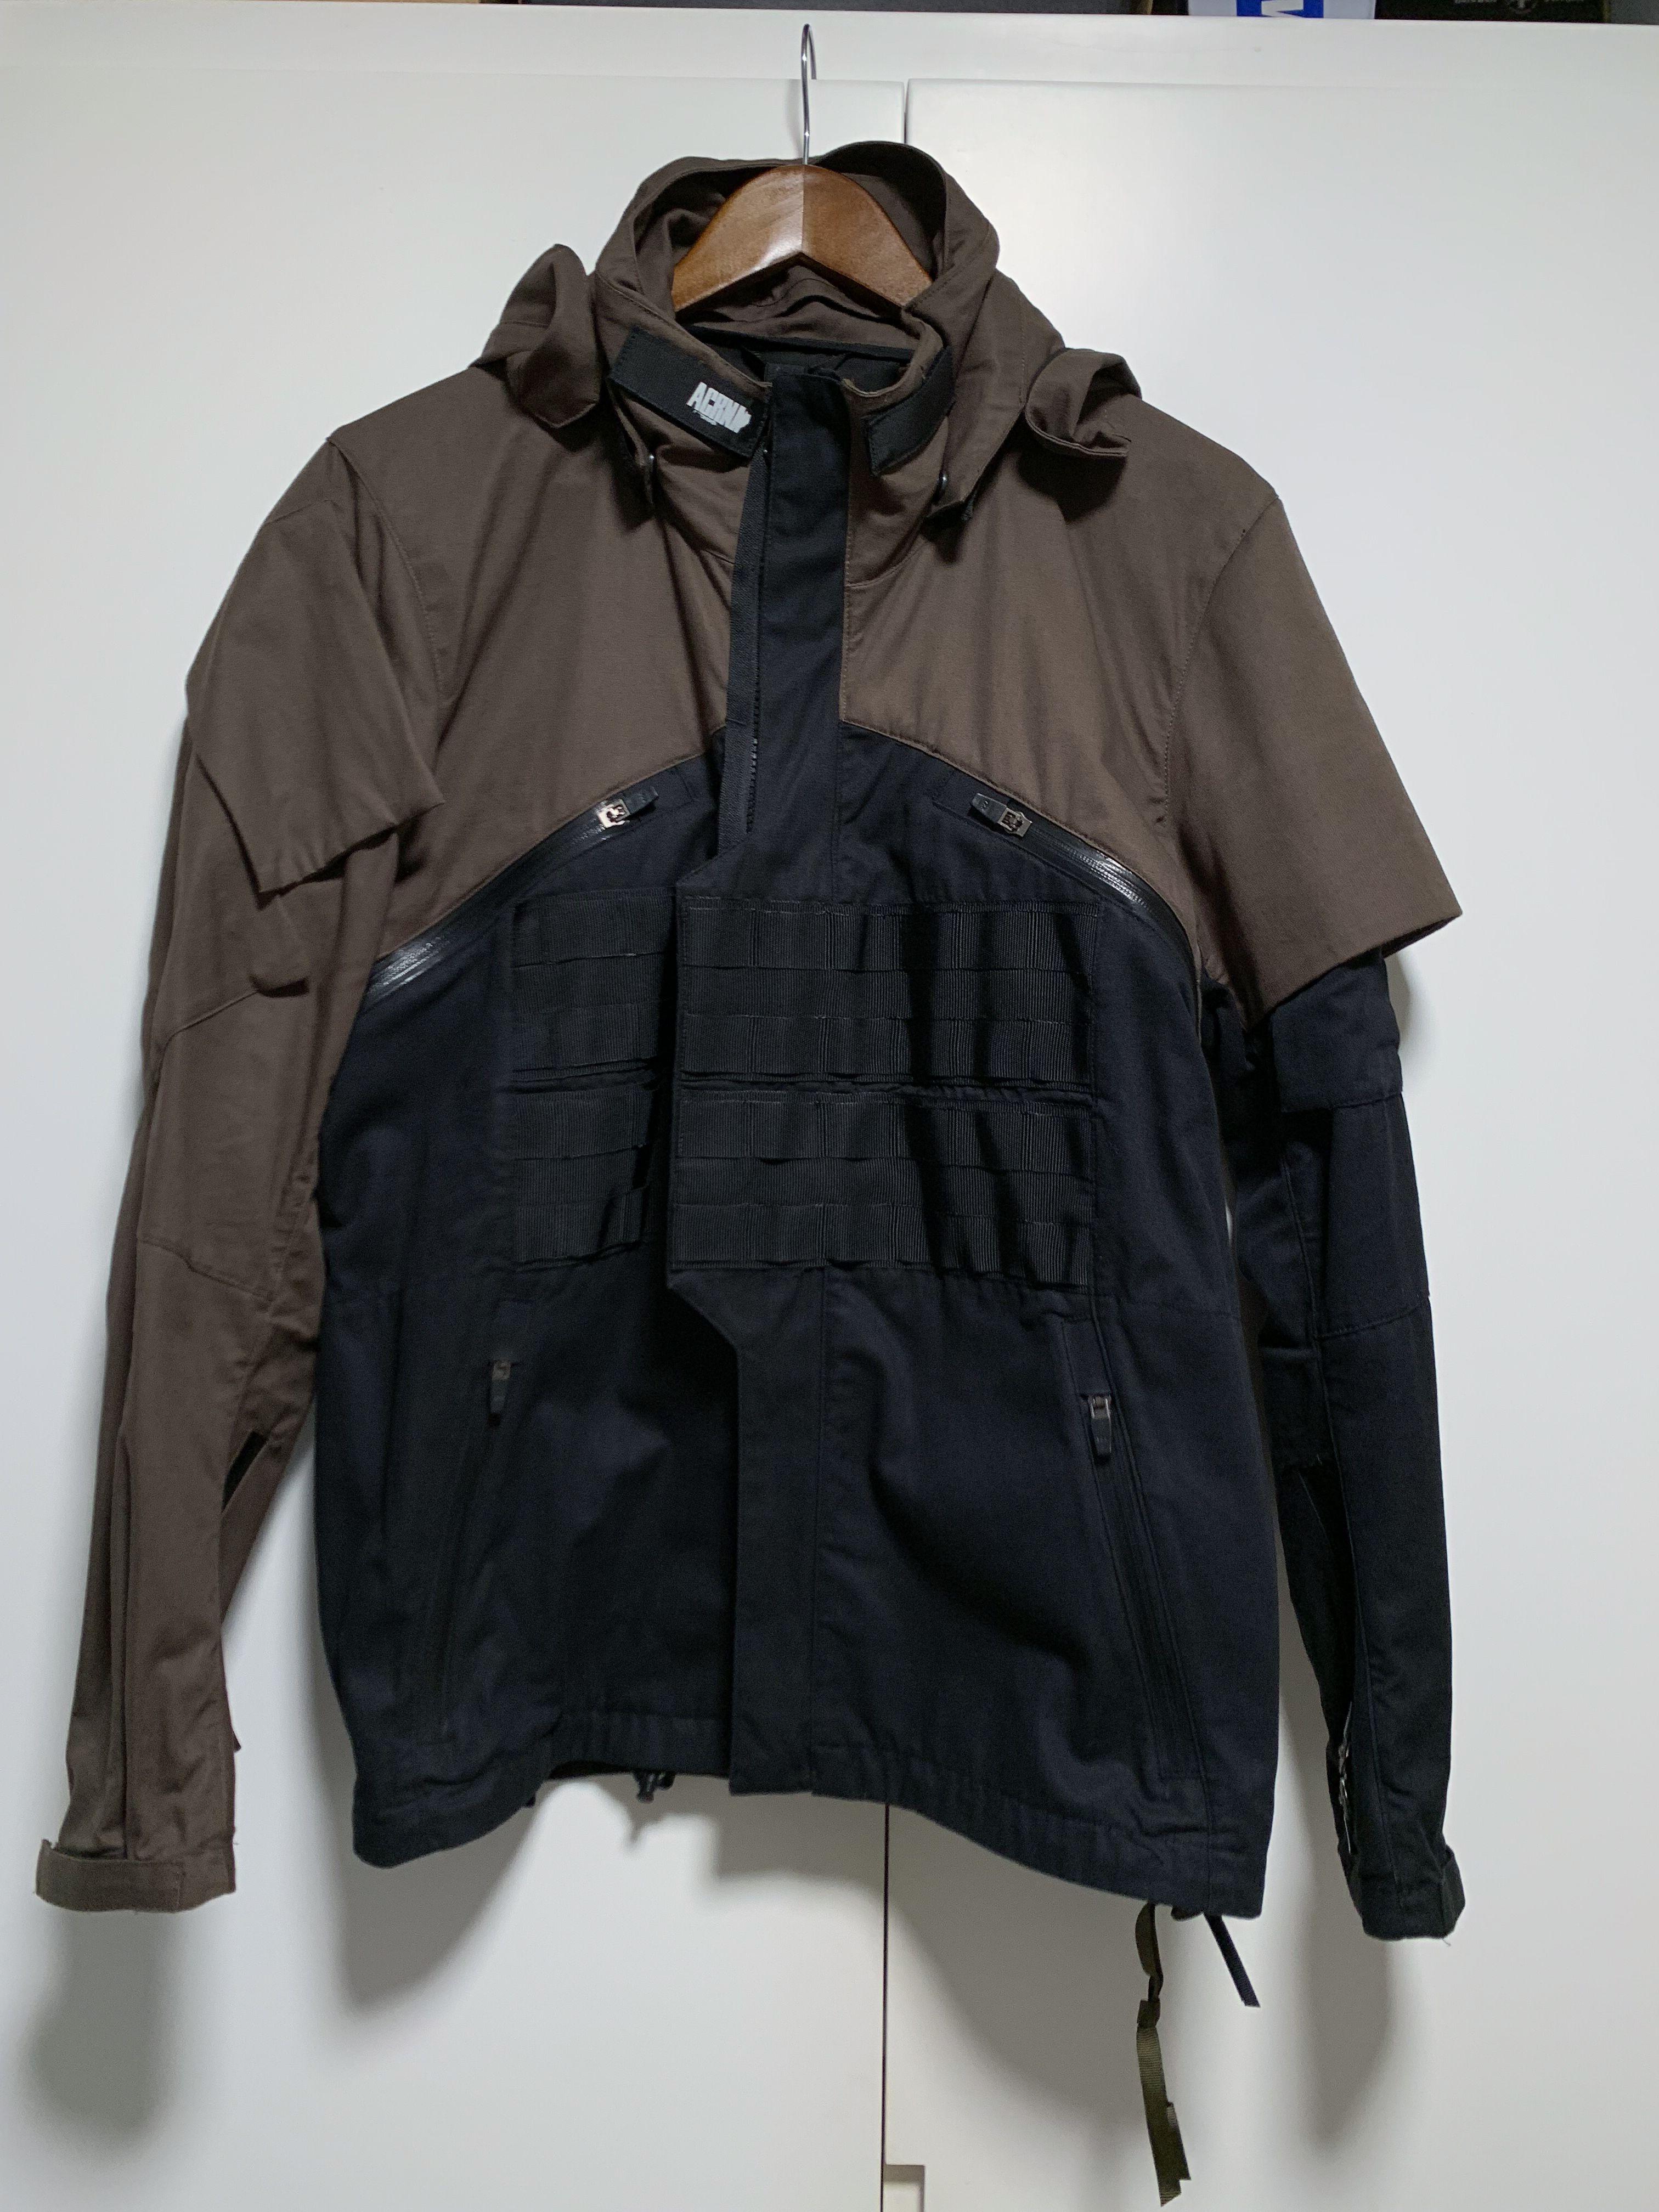 Acronym J1TS-S RAF Green/Black